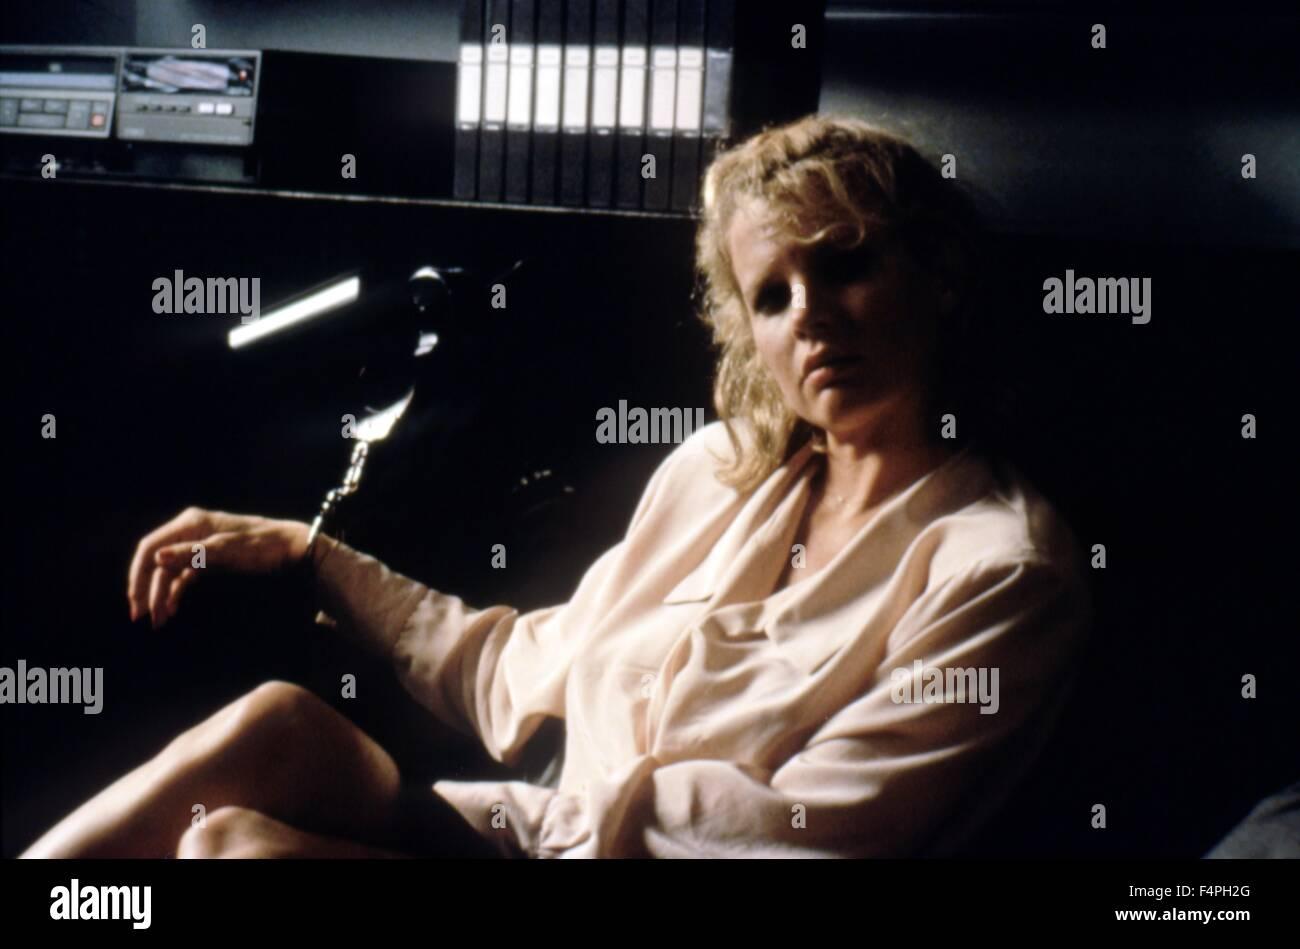 Kim Basinger / Nine 1/2 Weeks / 1986 directed by Adrian Lyne - Stock Image